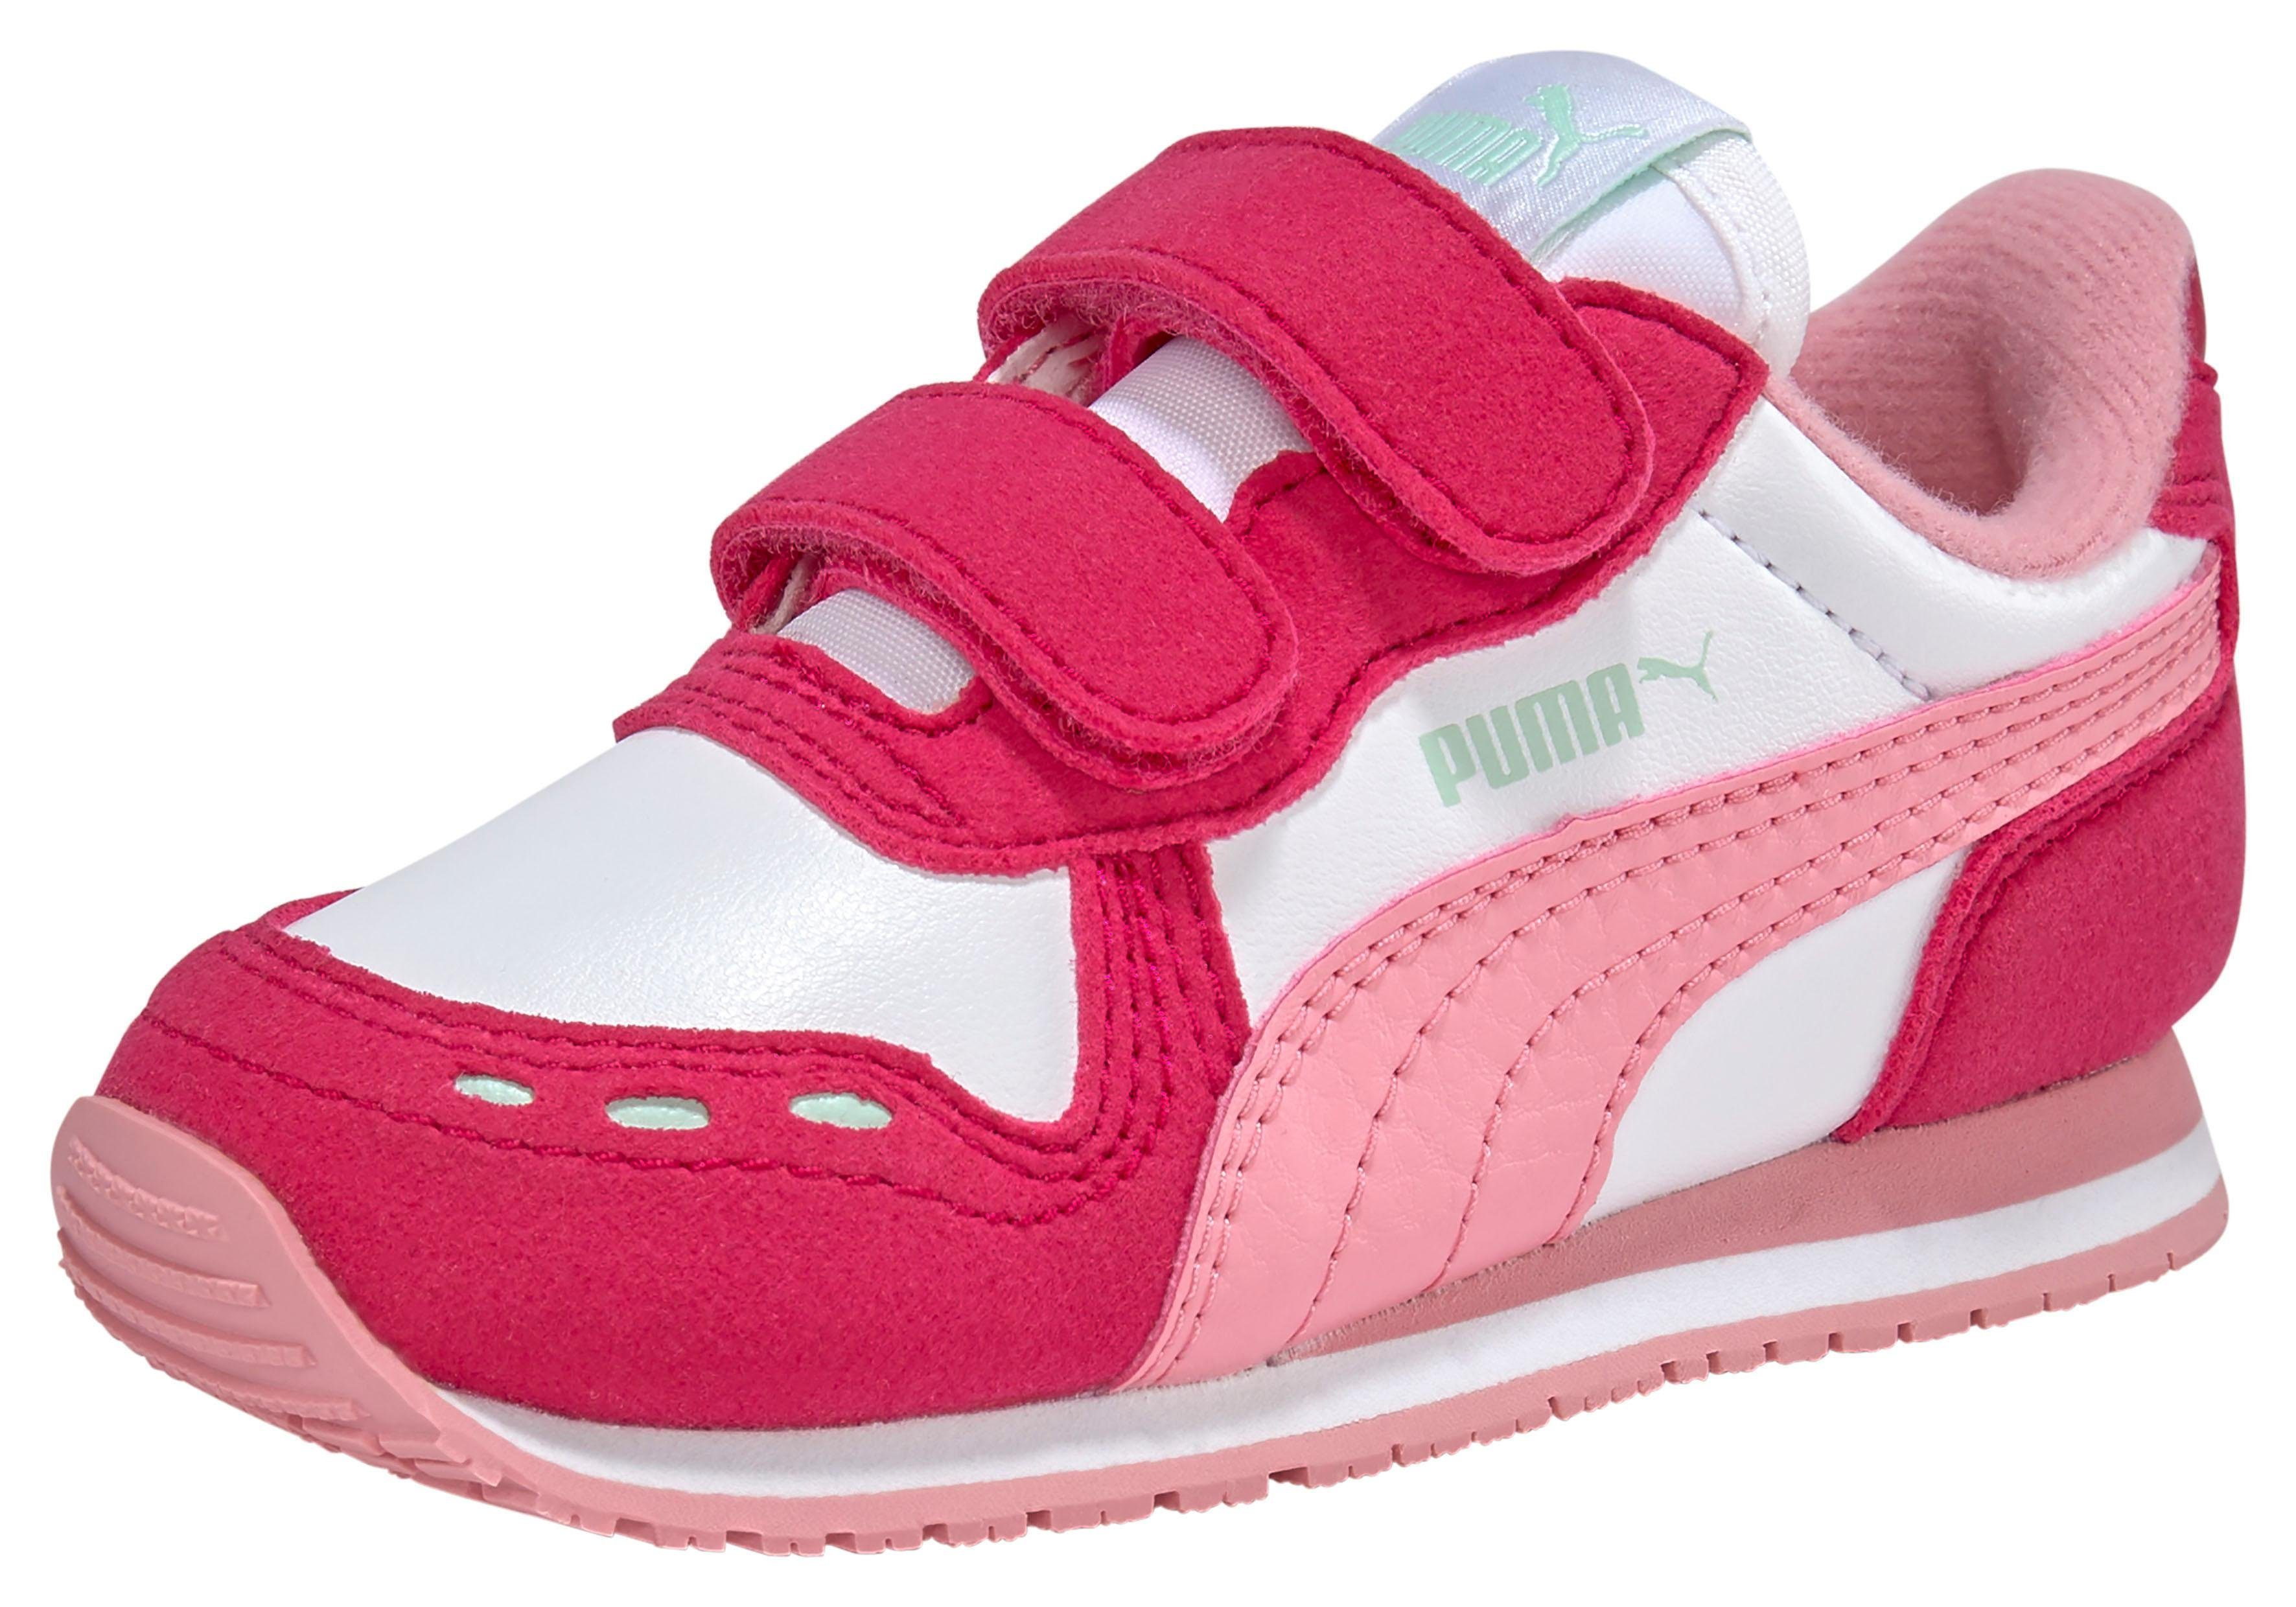 PUMA »Cabana Racer SL V PS & Inf« Sneaker kaufen | OTTO